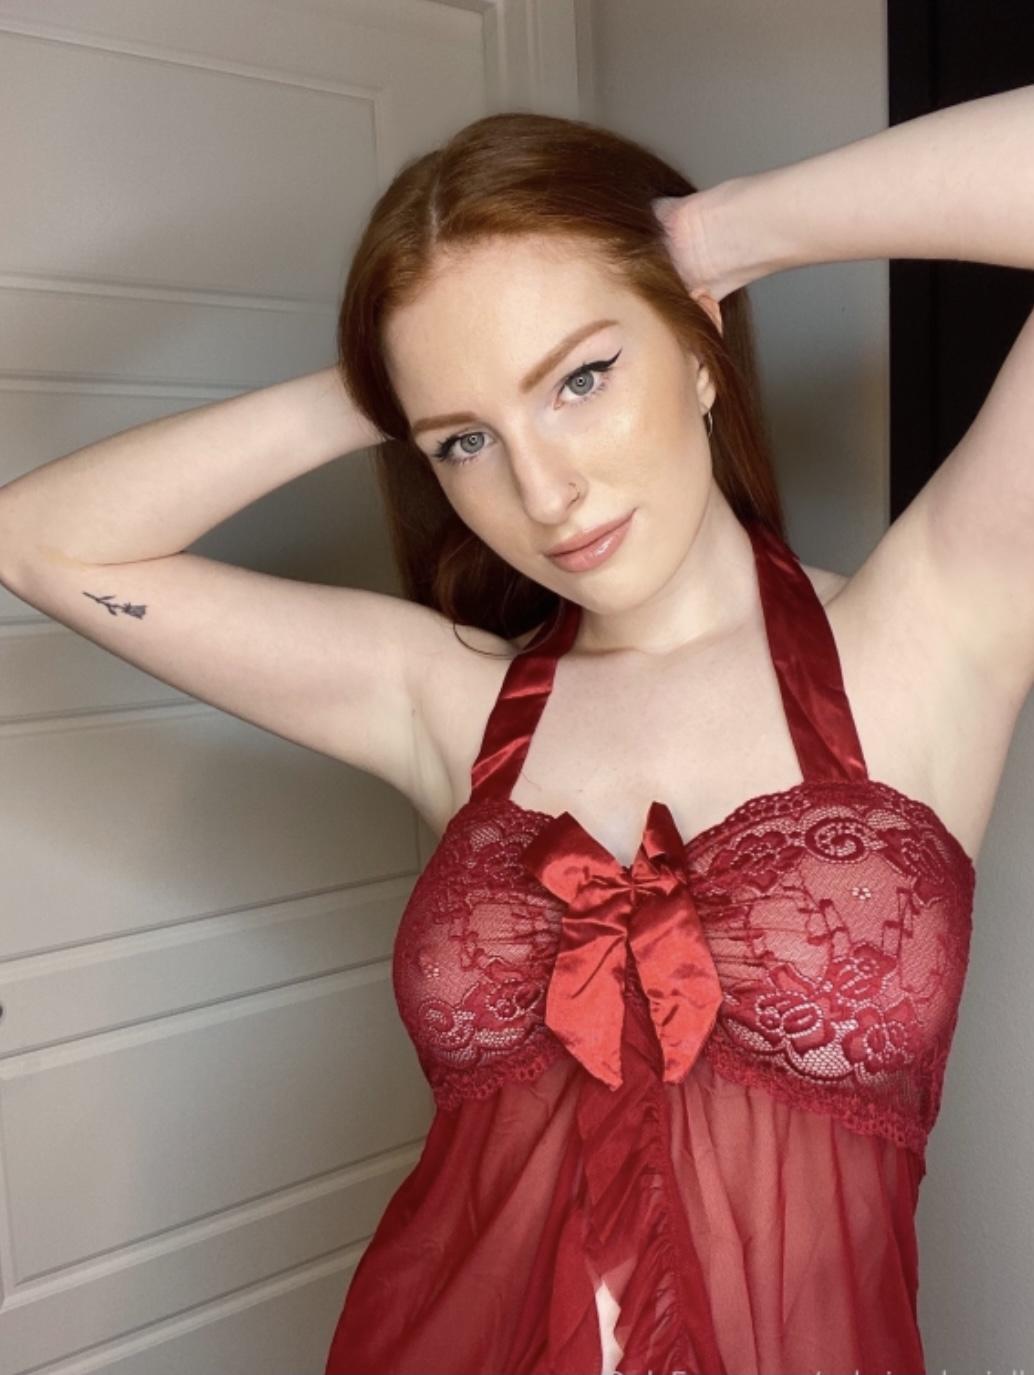 Sabrina Danielle Red Lingerie